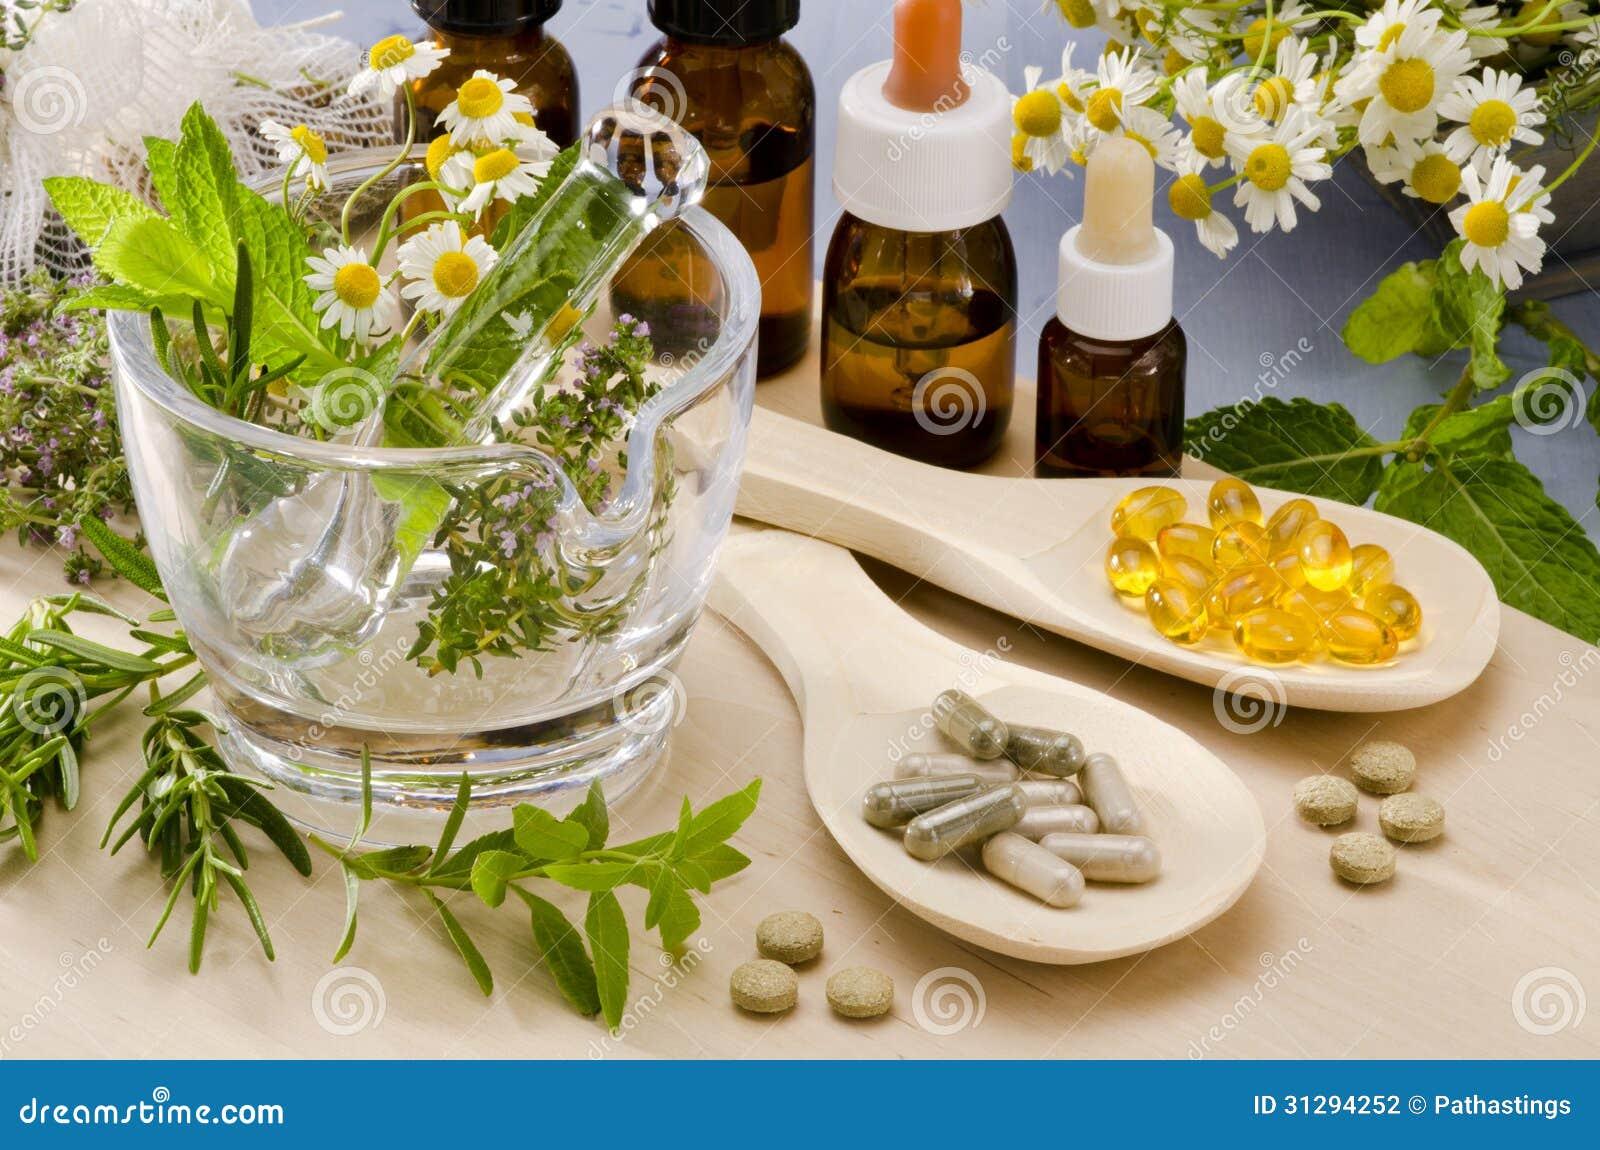 Different herbs royalty free stock image image 16265346 - Alternativmedizin Stockfotografie